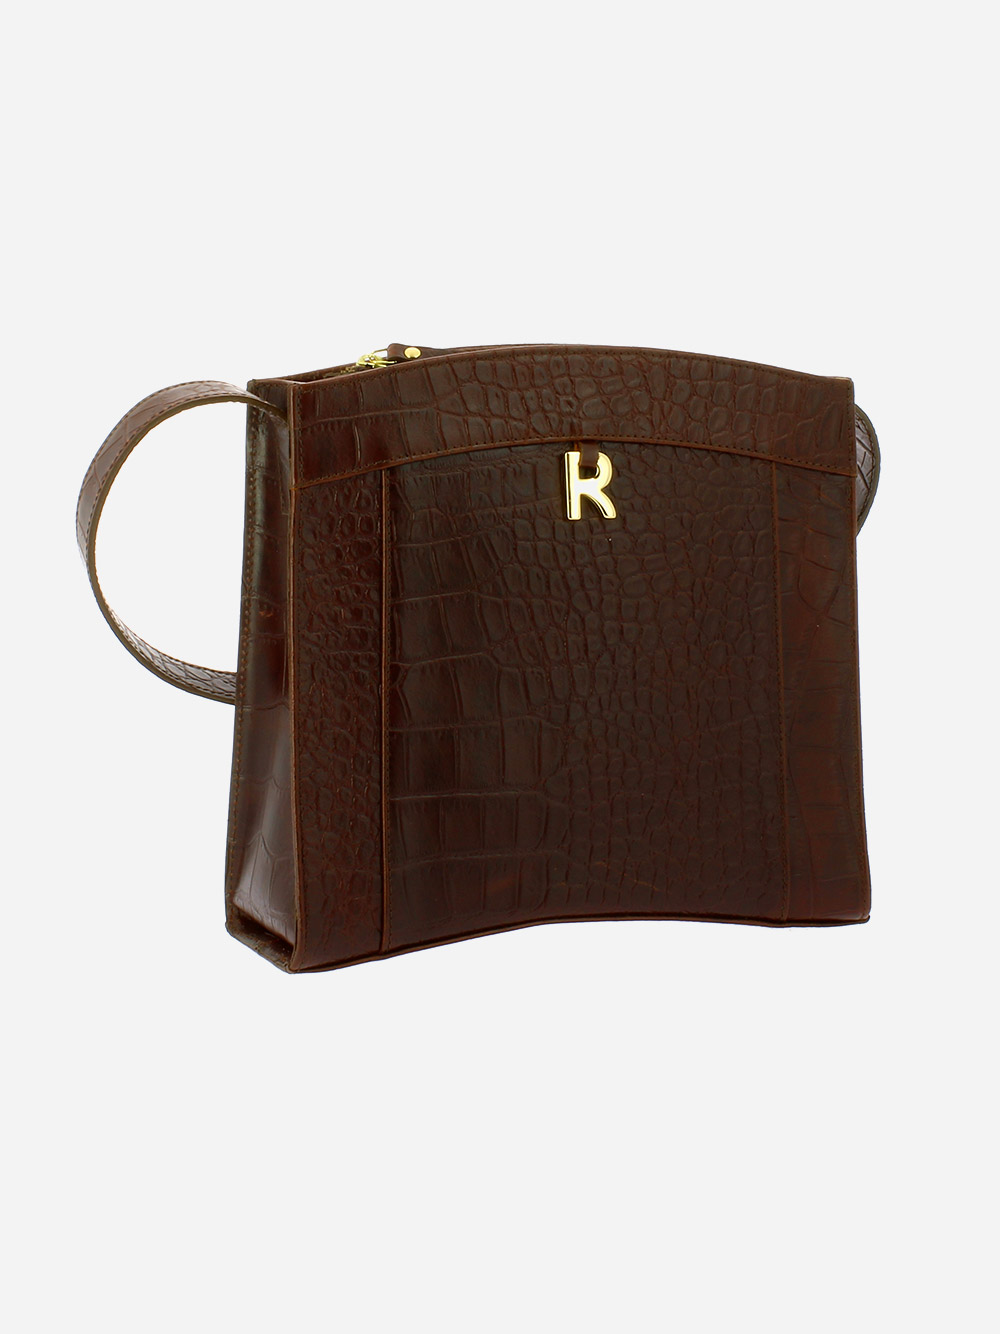 Croco Guilly Brown Crossbody Bag